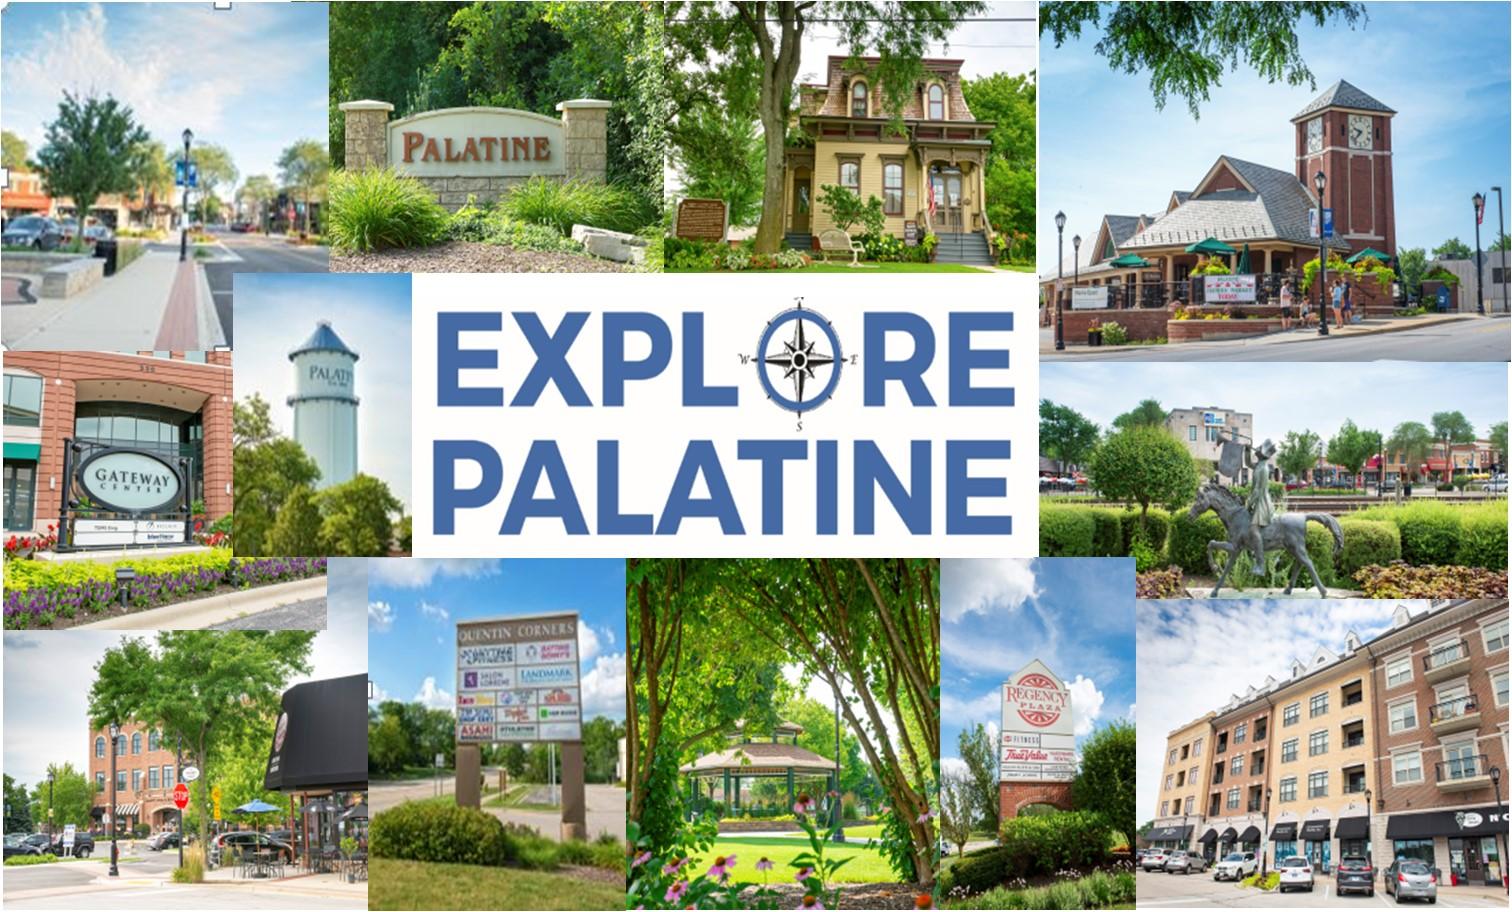 Explore-Palatine-2020.jpg